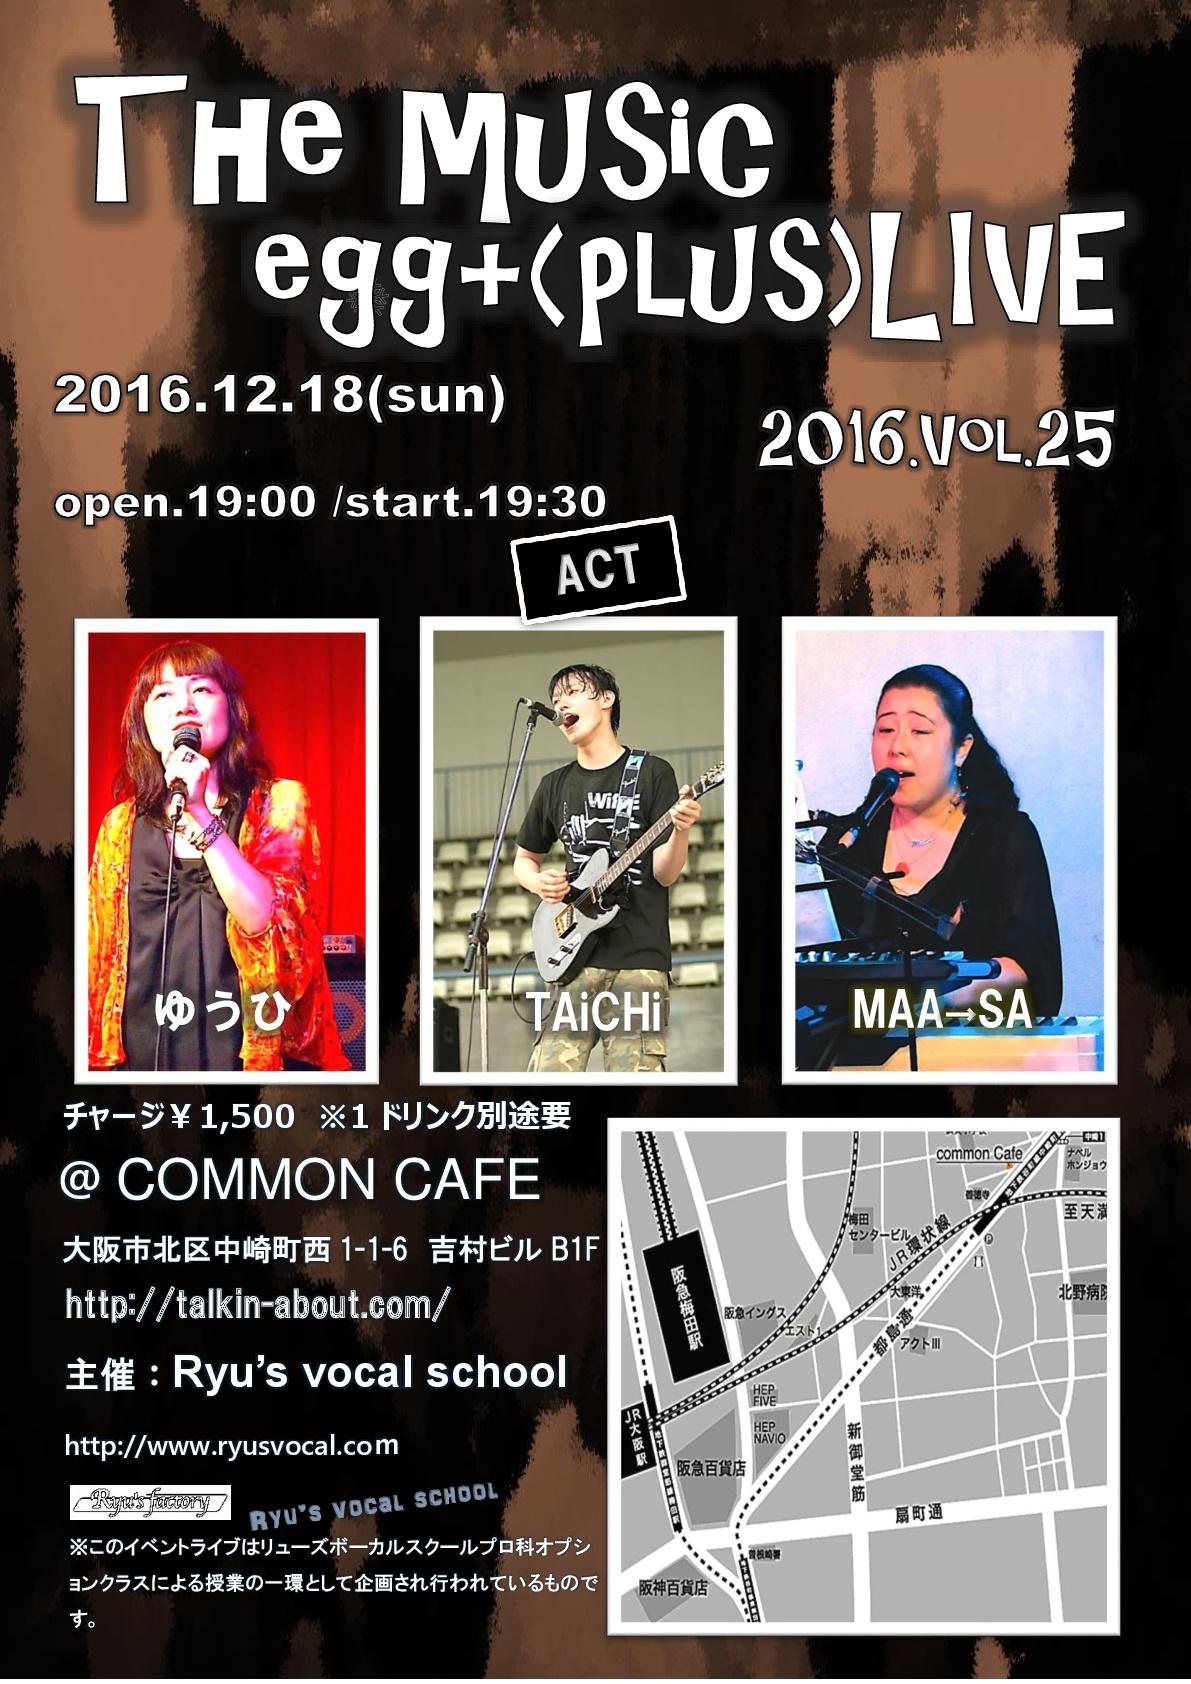 Ryu'sイベント The music egg+ vol.25